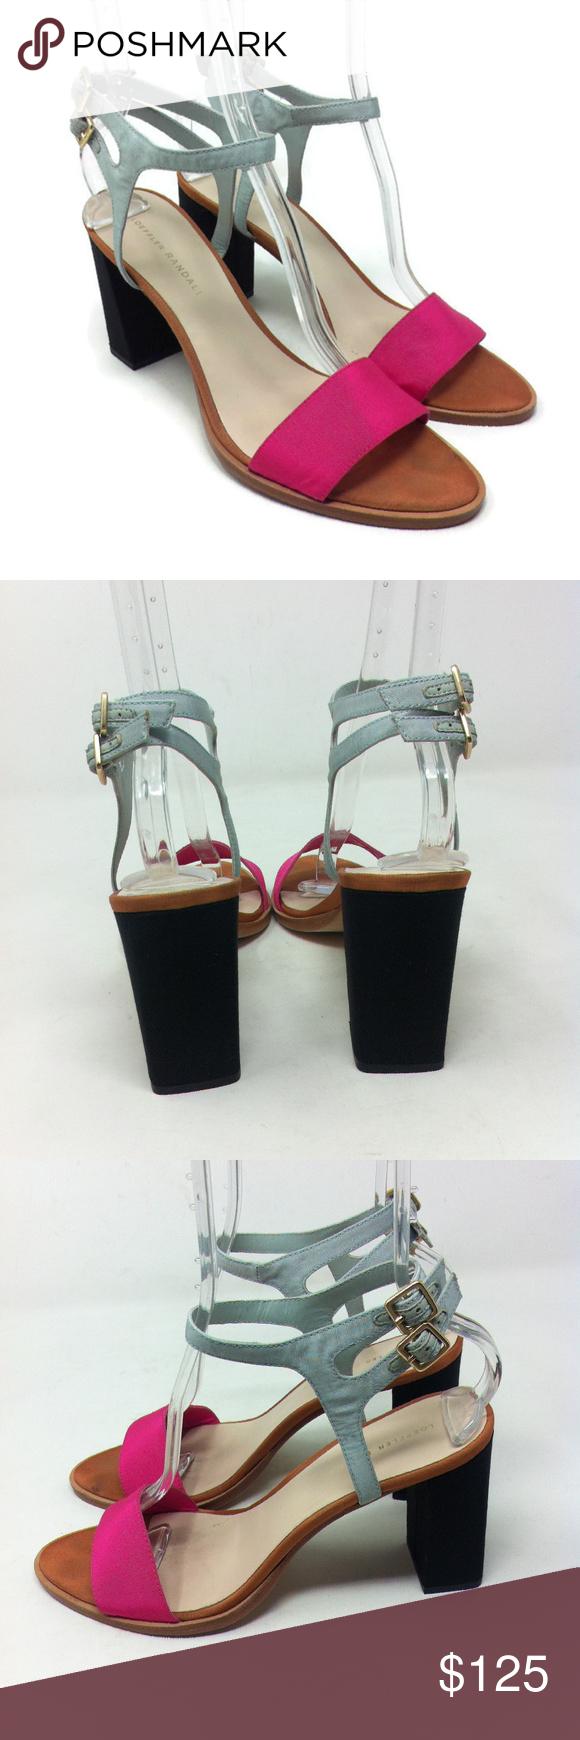 fd81f4a16249 Loeffler Randall Sylvia Pink Black Block Heels 10 Loeffler Randall Women s  Heels Sylvia Block Sandal Pink